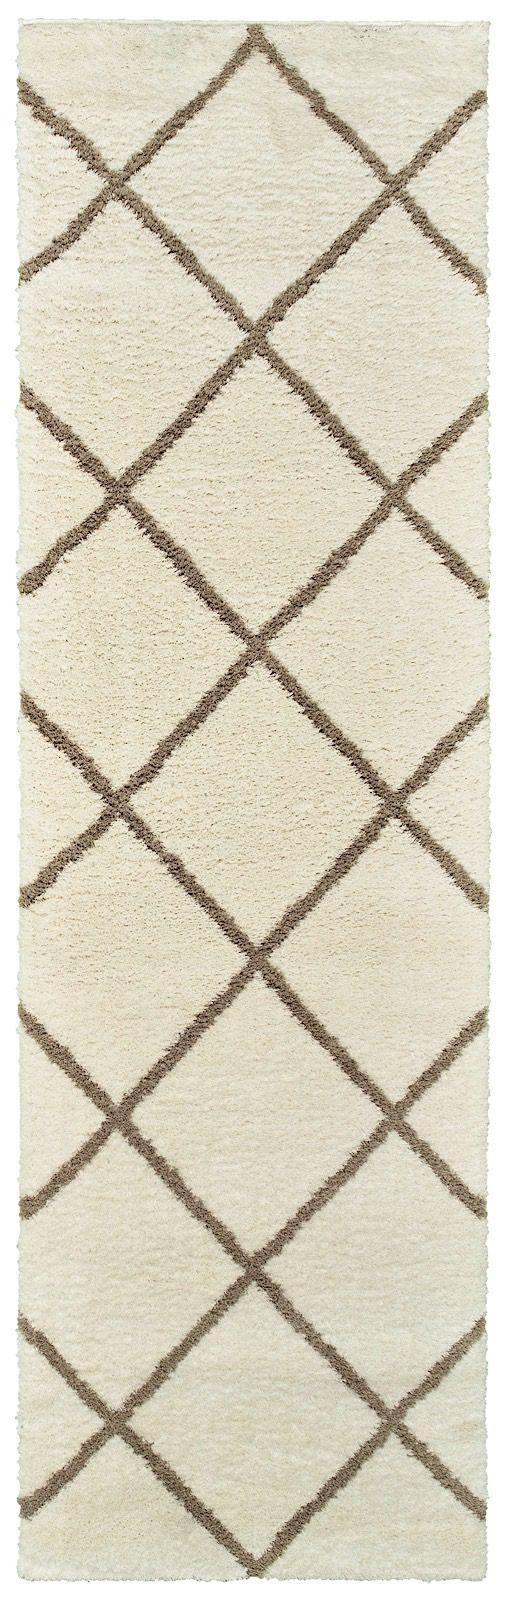 oriental weavers verona contemporary area rug collection